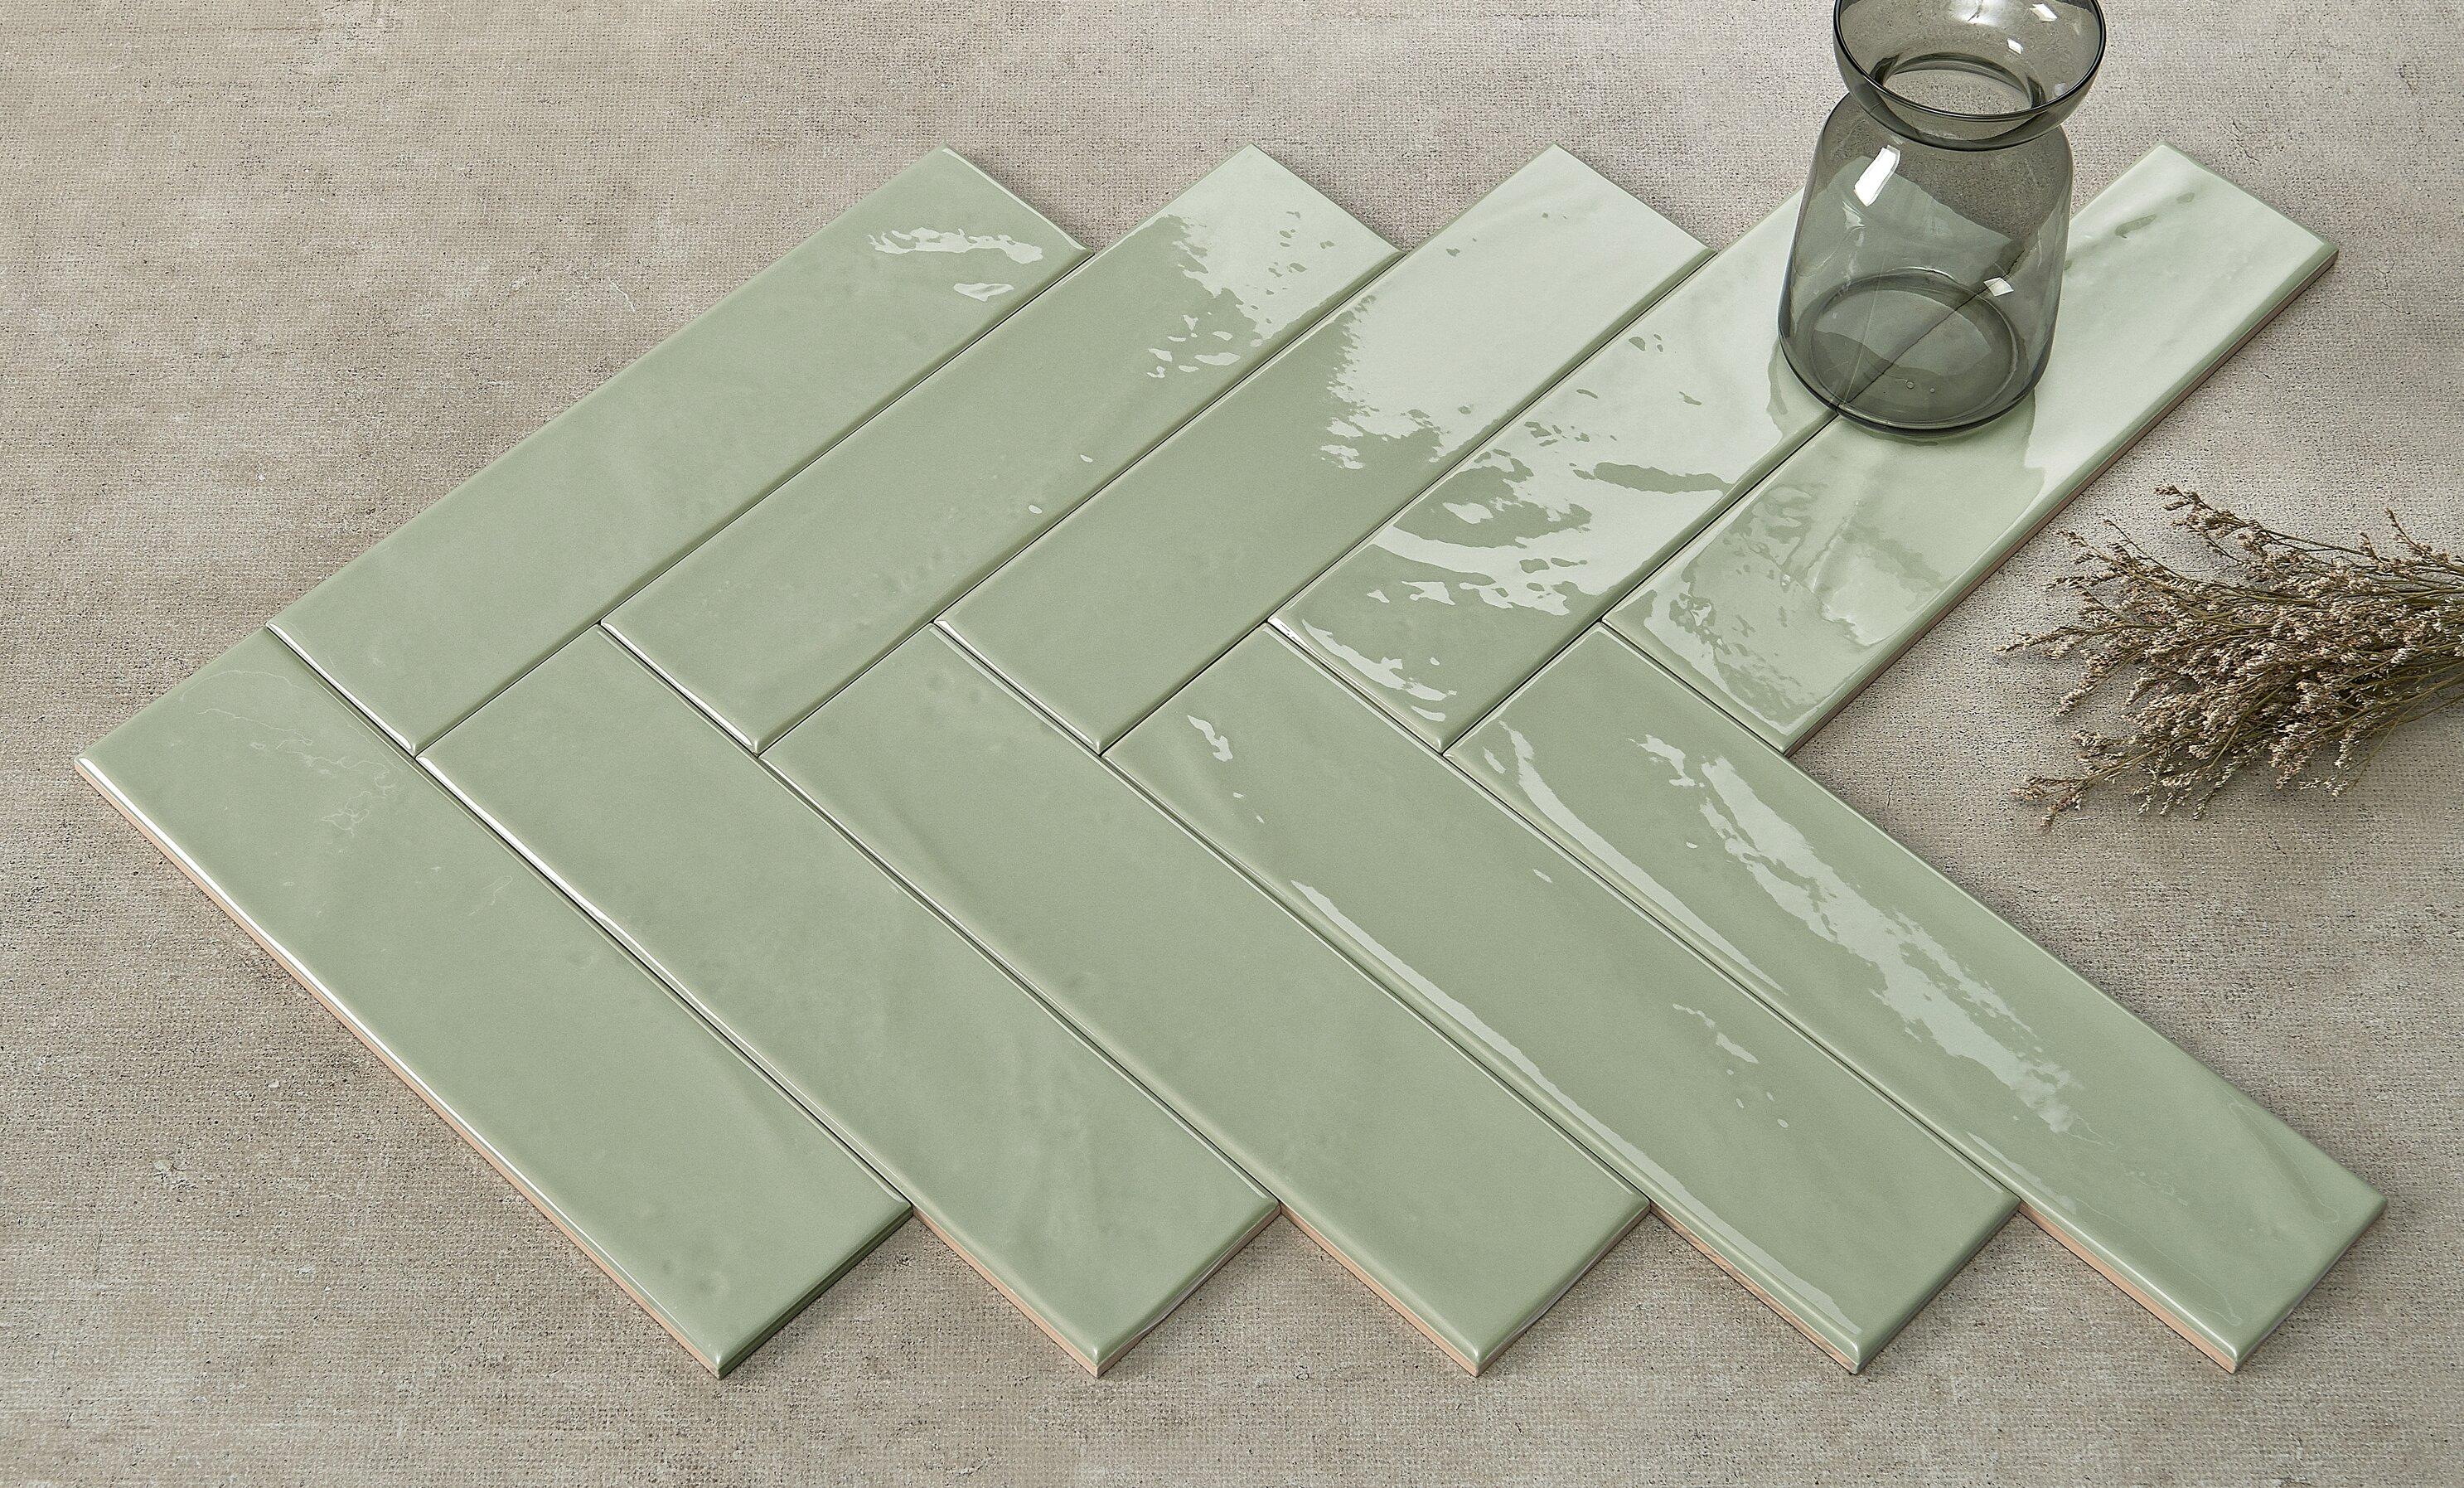 Walkon Tile Mason 3 X 12 Ceramic Subway Tile In Sage Green Glossy